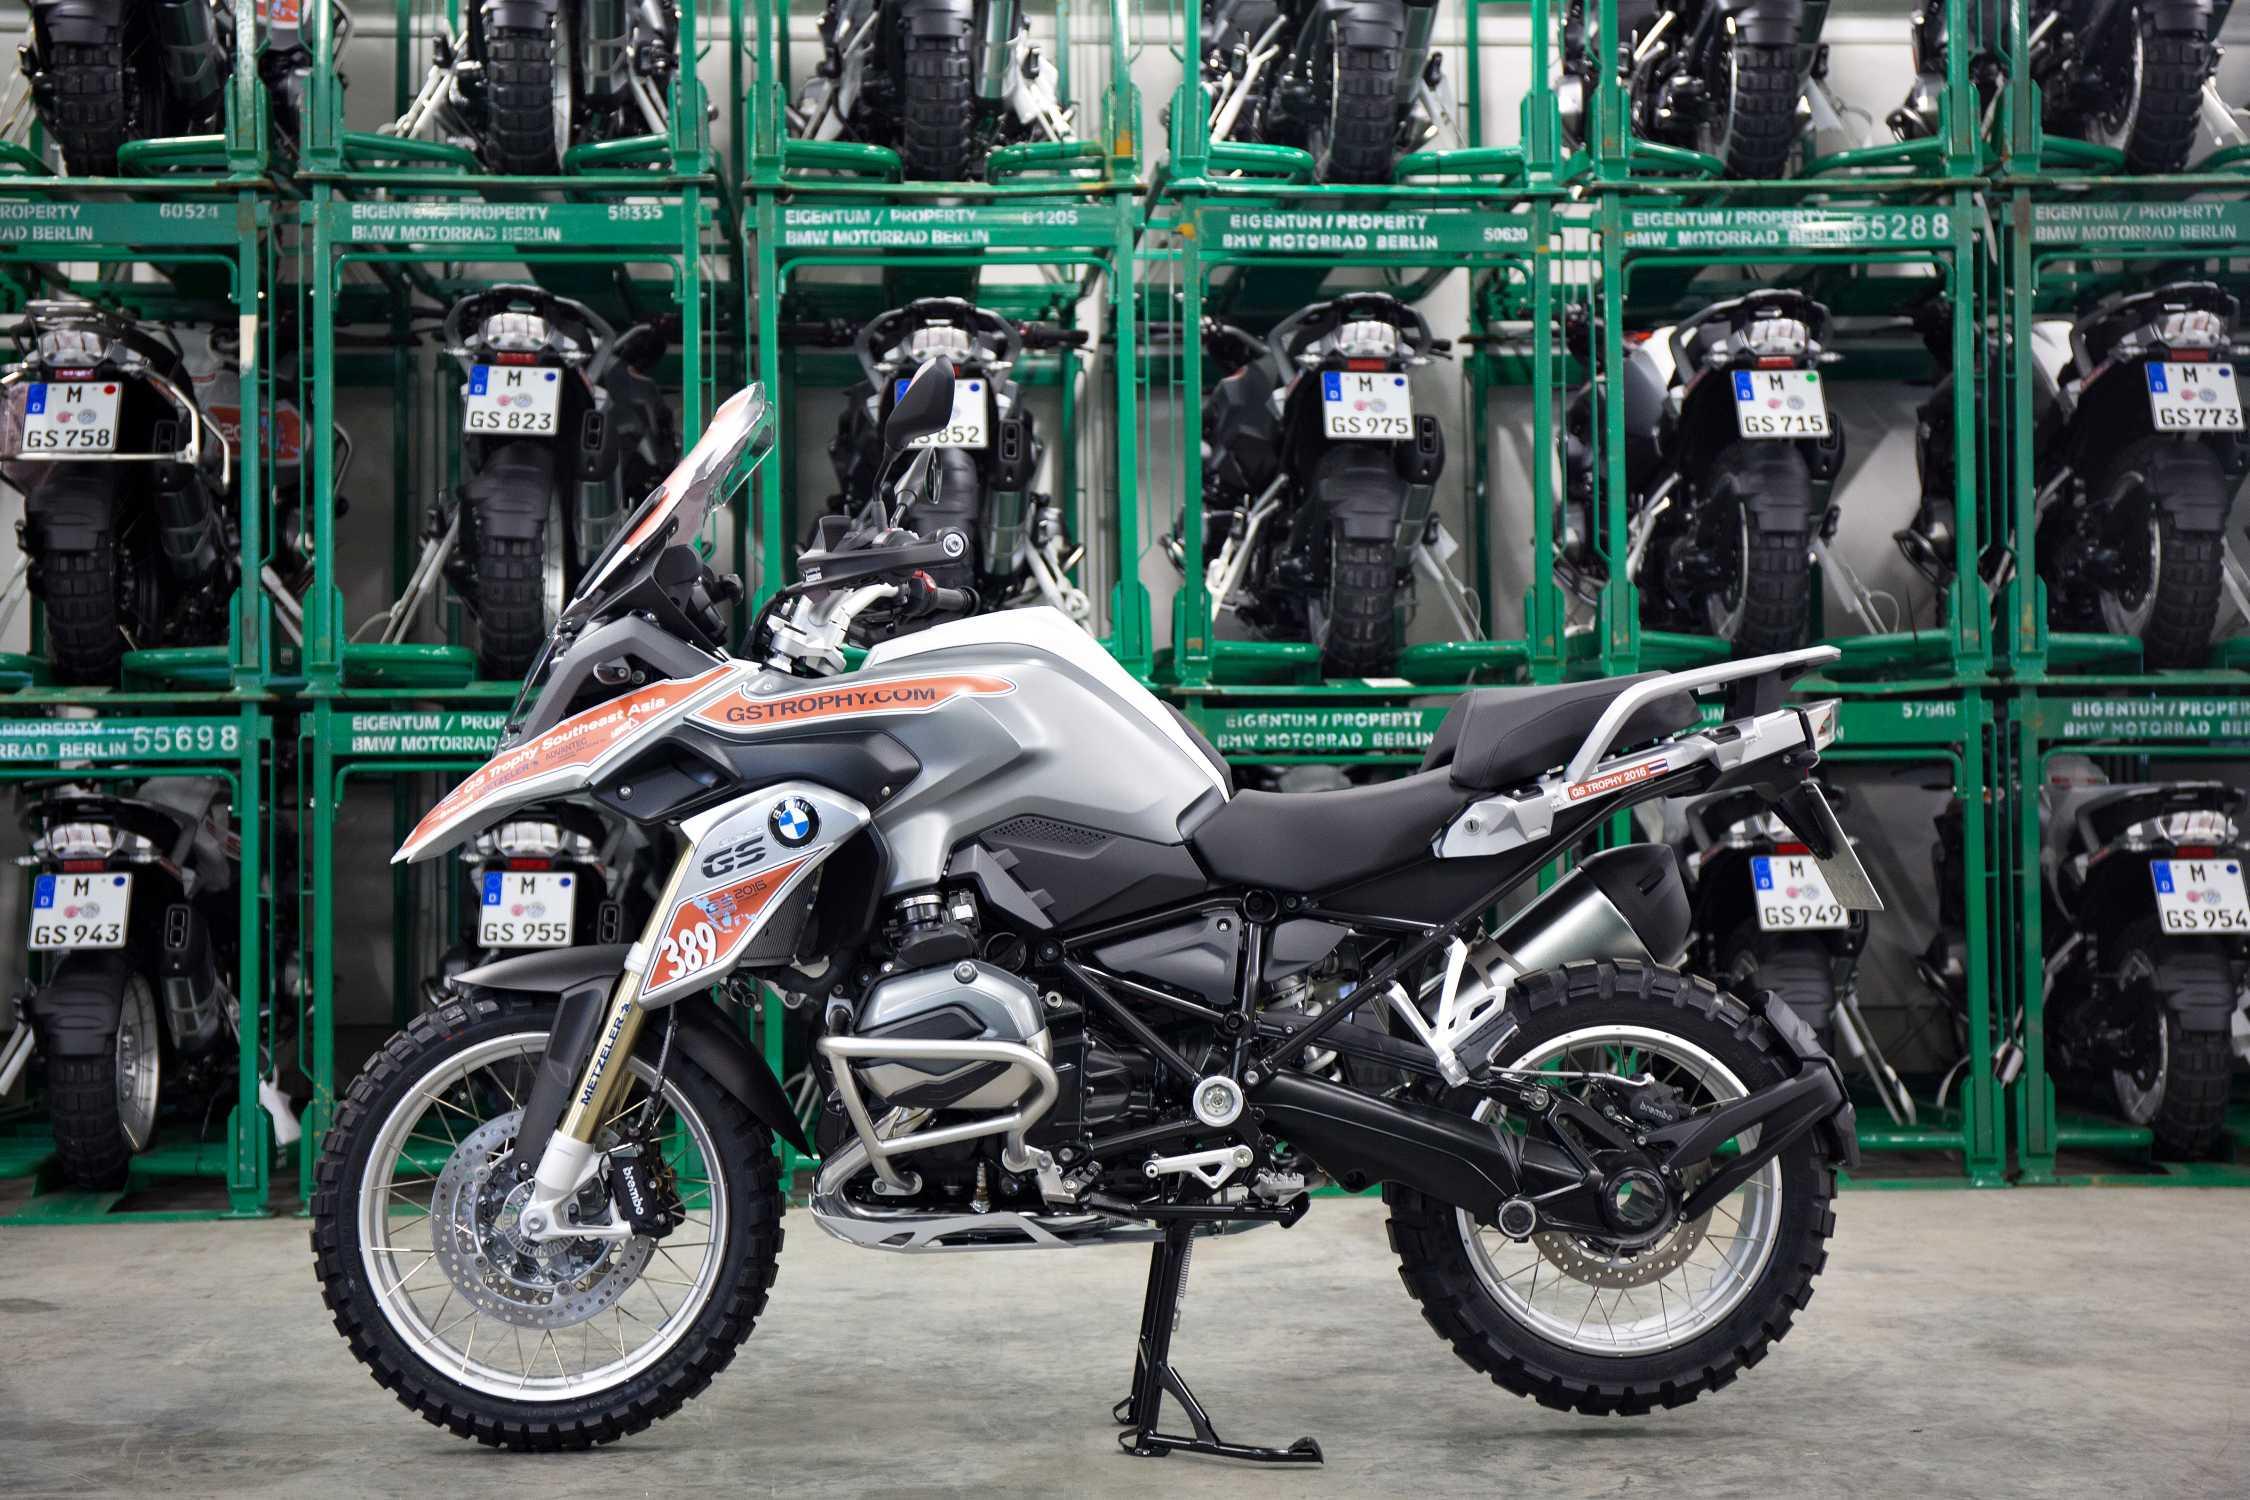 bmw motorrad international gs trophy southeast asia 2016. Black Bedroom Furniture Sets. Home Design Ideas